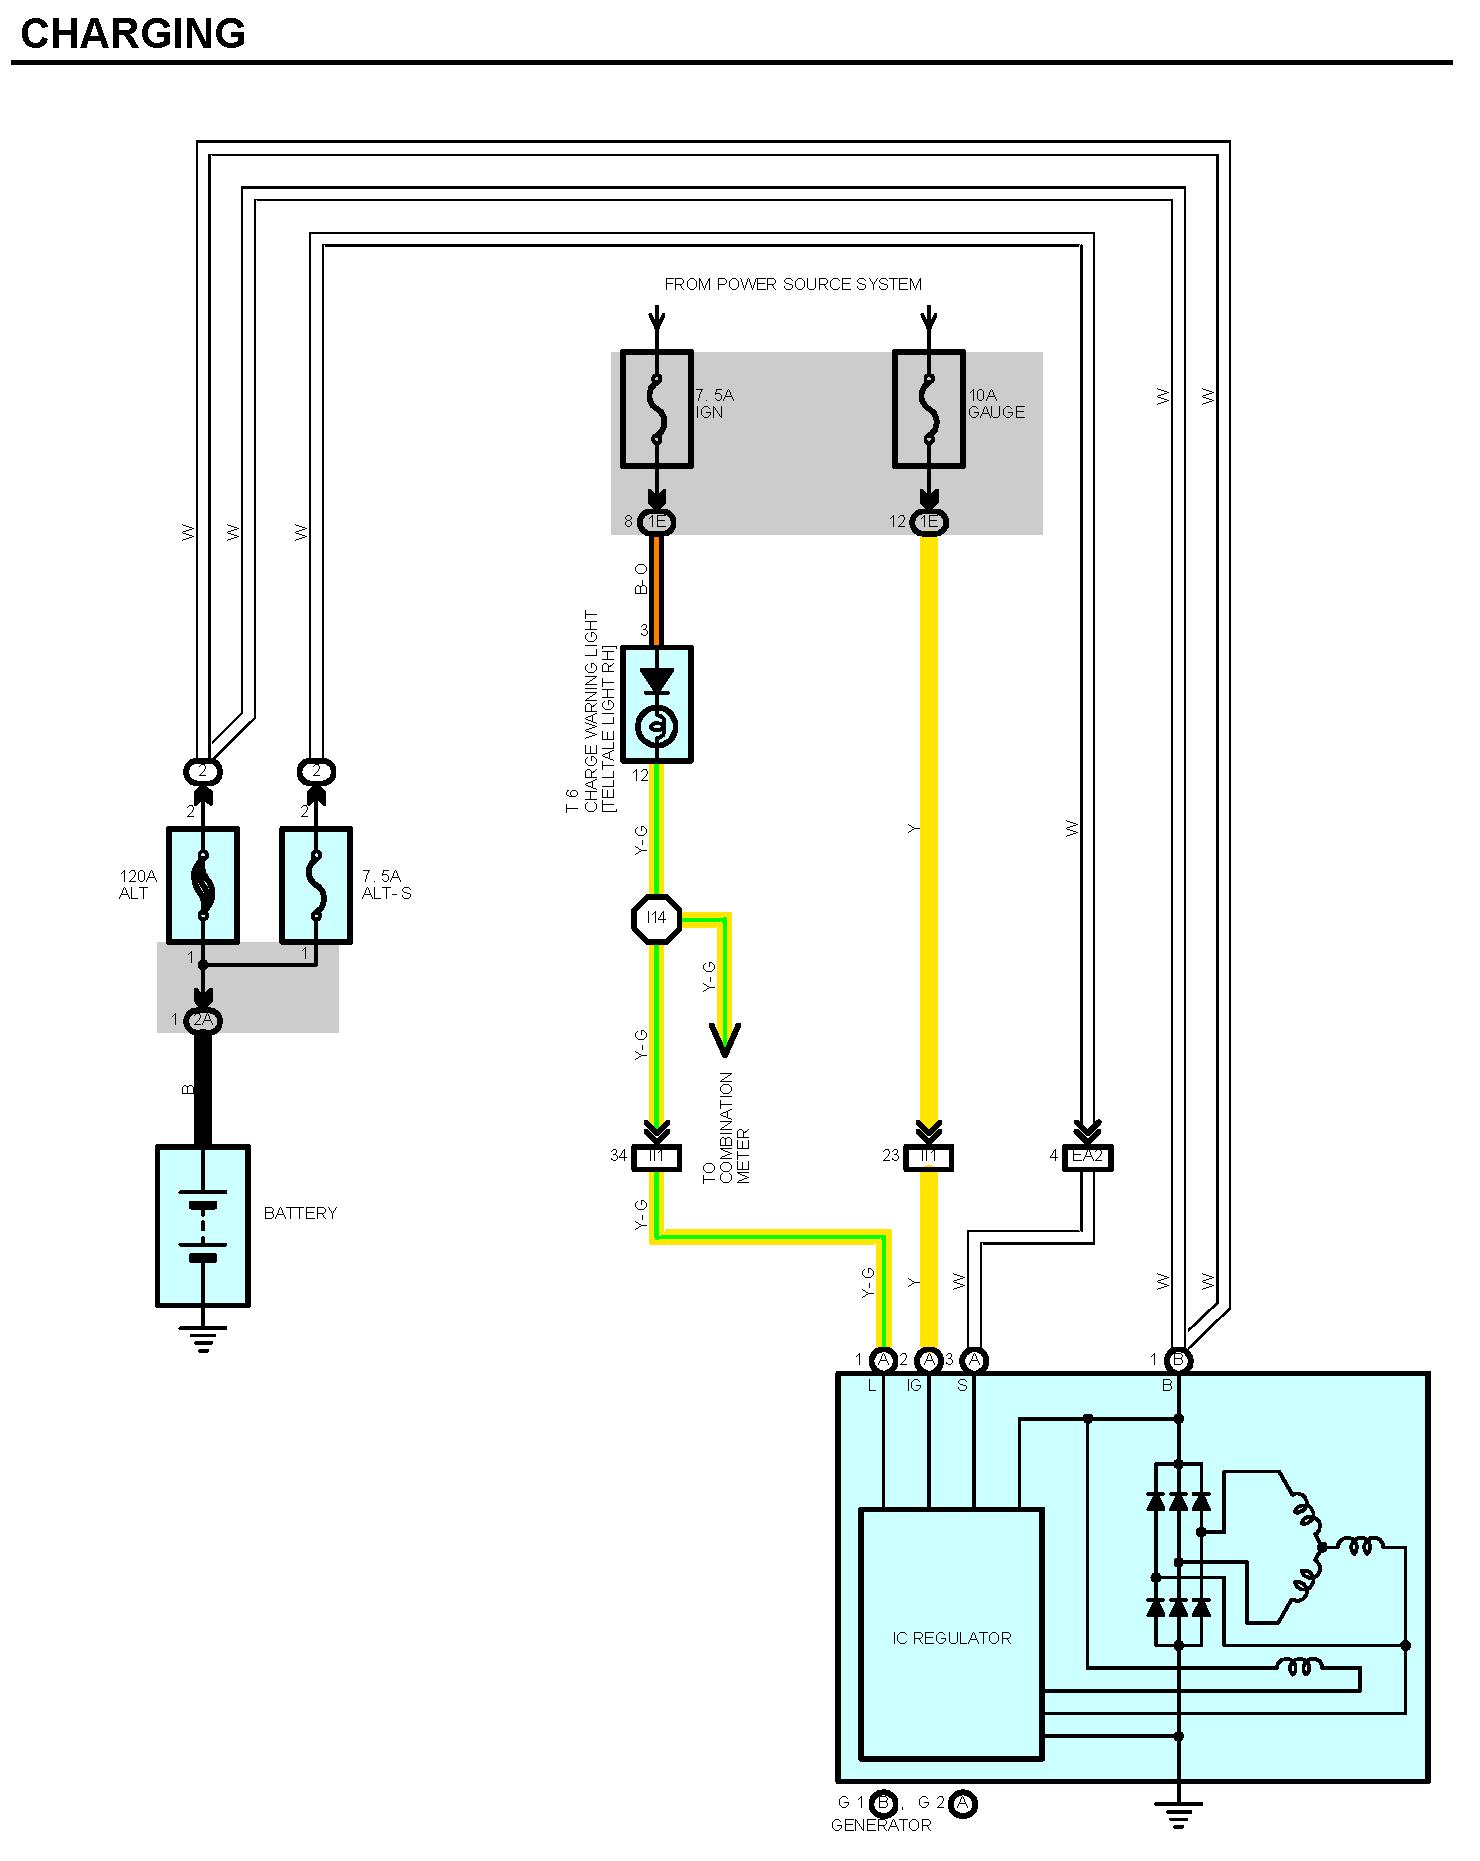 1980 Toyota Alternator Wiring Diagram Wiring Diagram Approval A Approval A Zaafran It